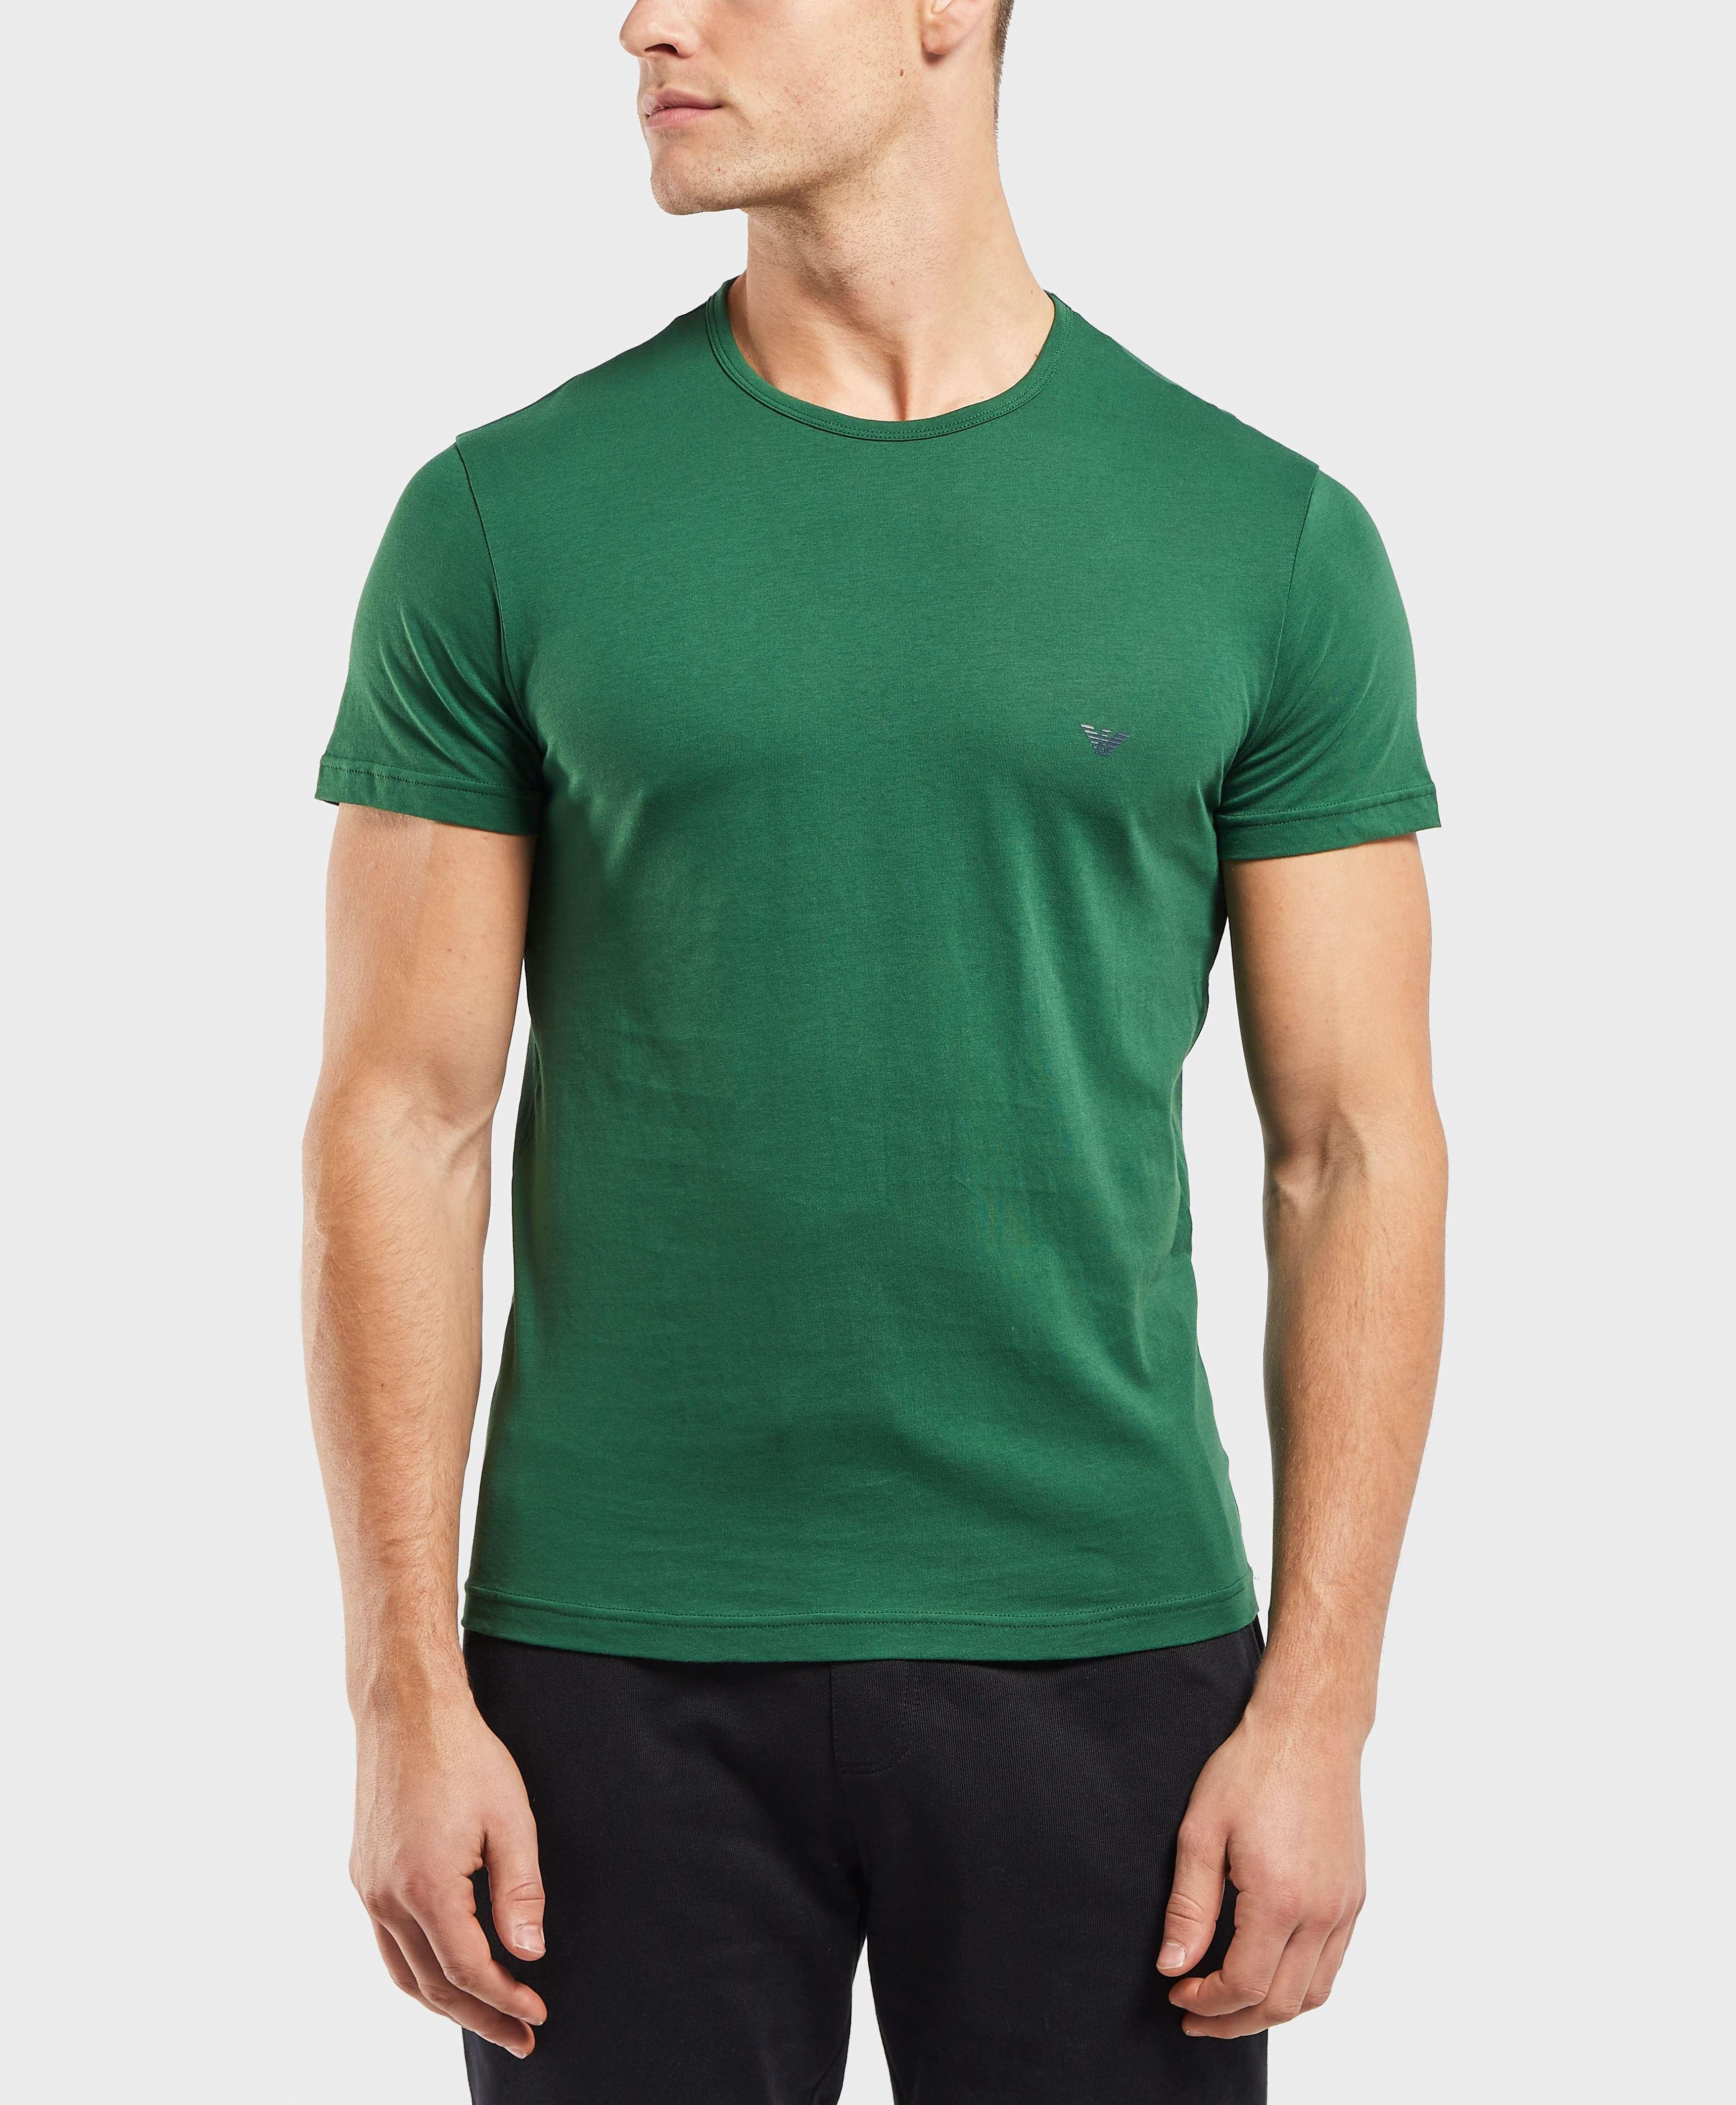 Emporio Armani 2 Pack Short Sleeve T-Shirt